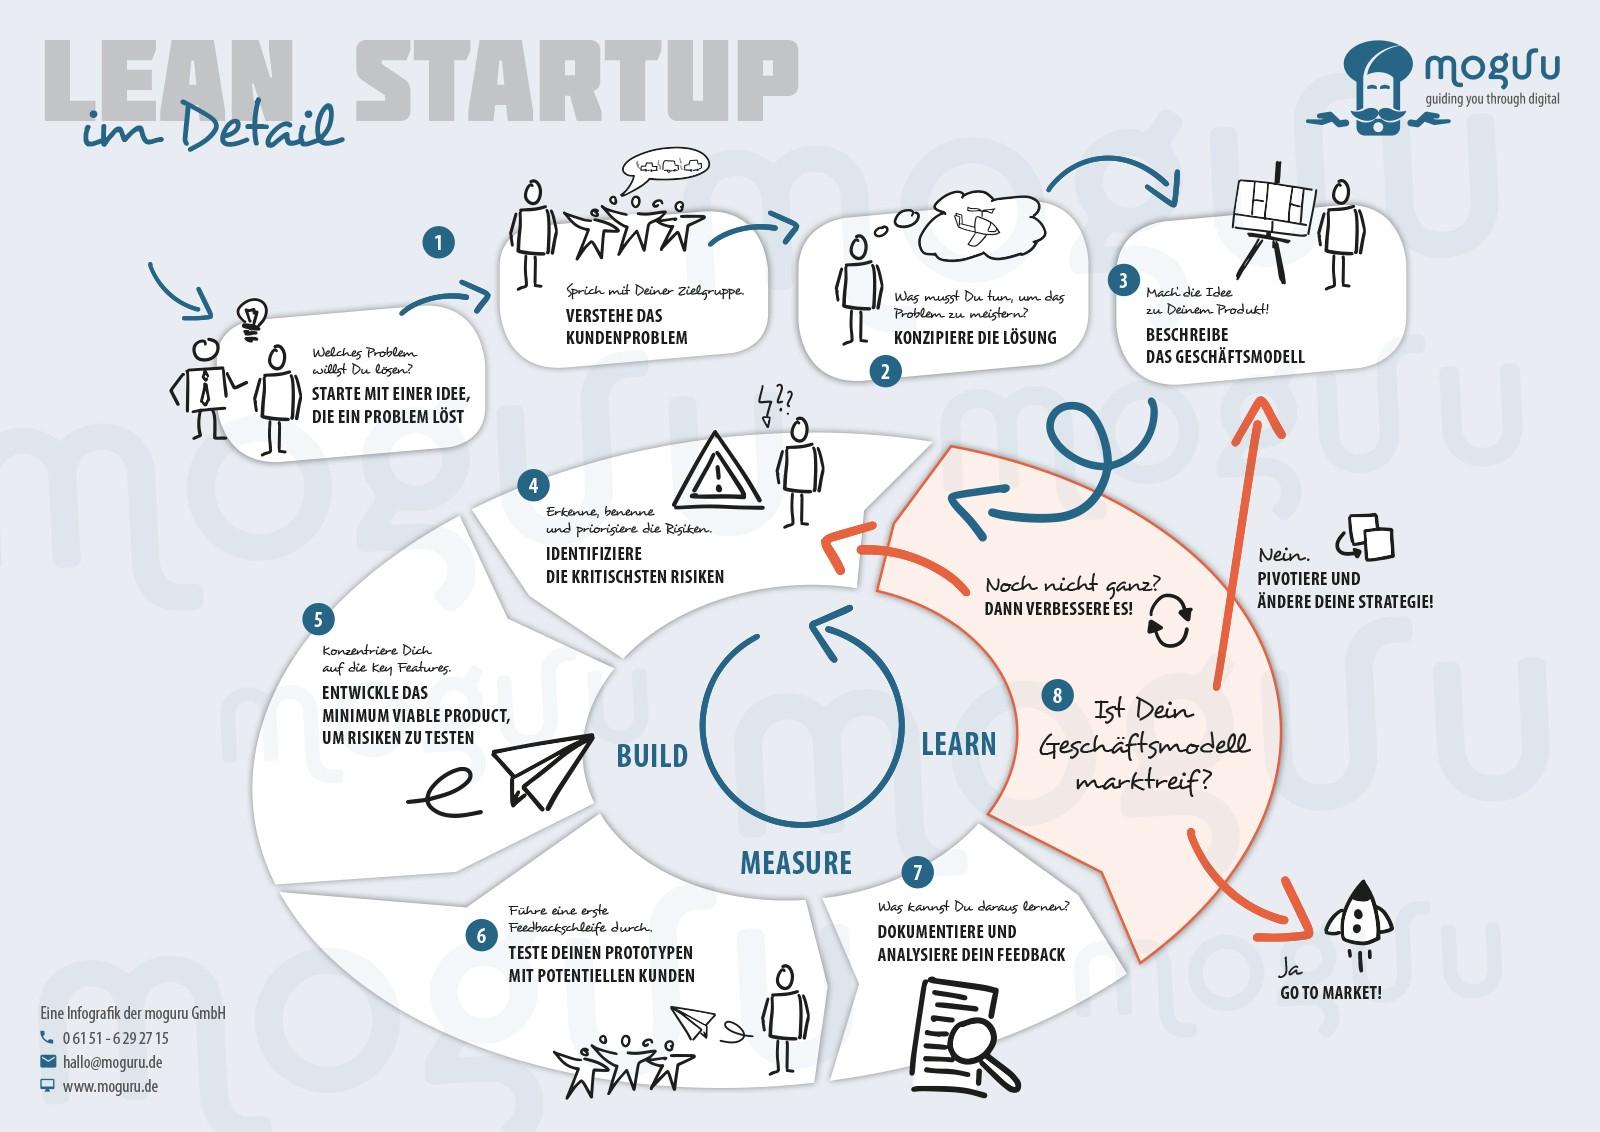 Lean Startup im Detail - Infografik